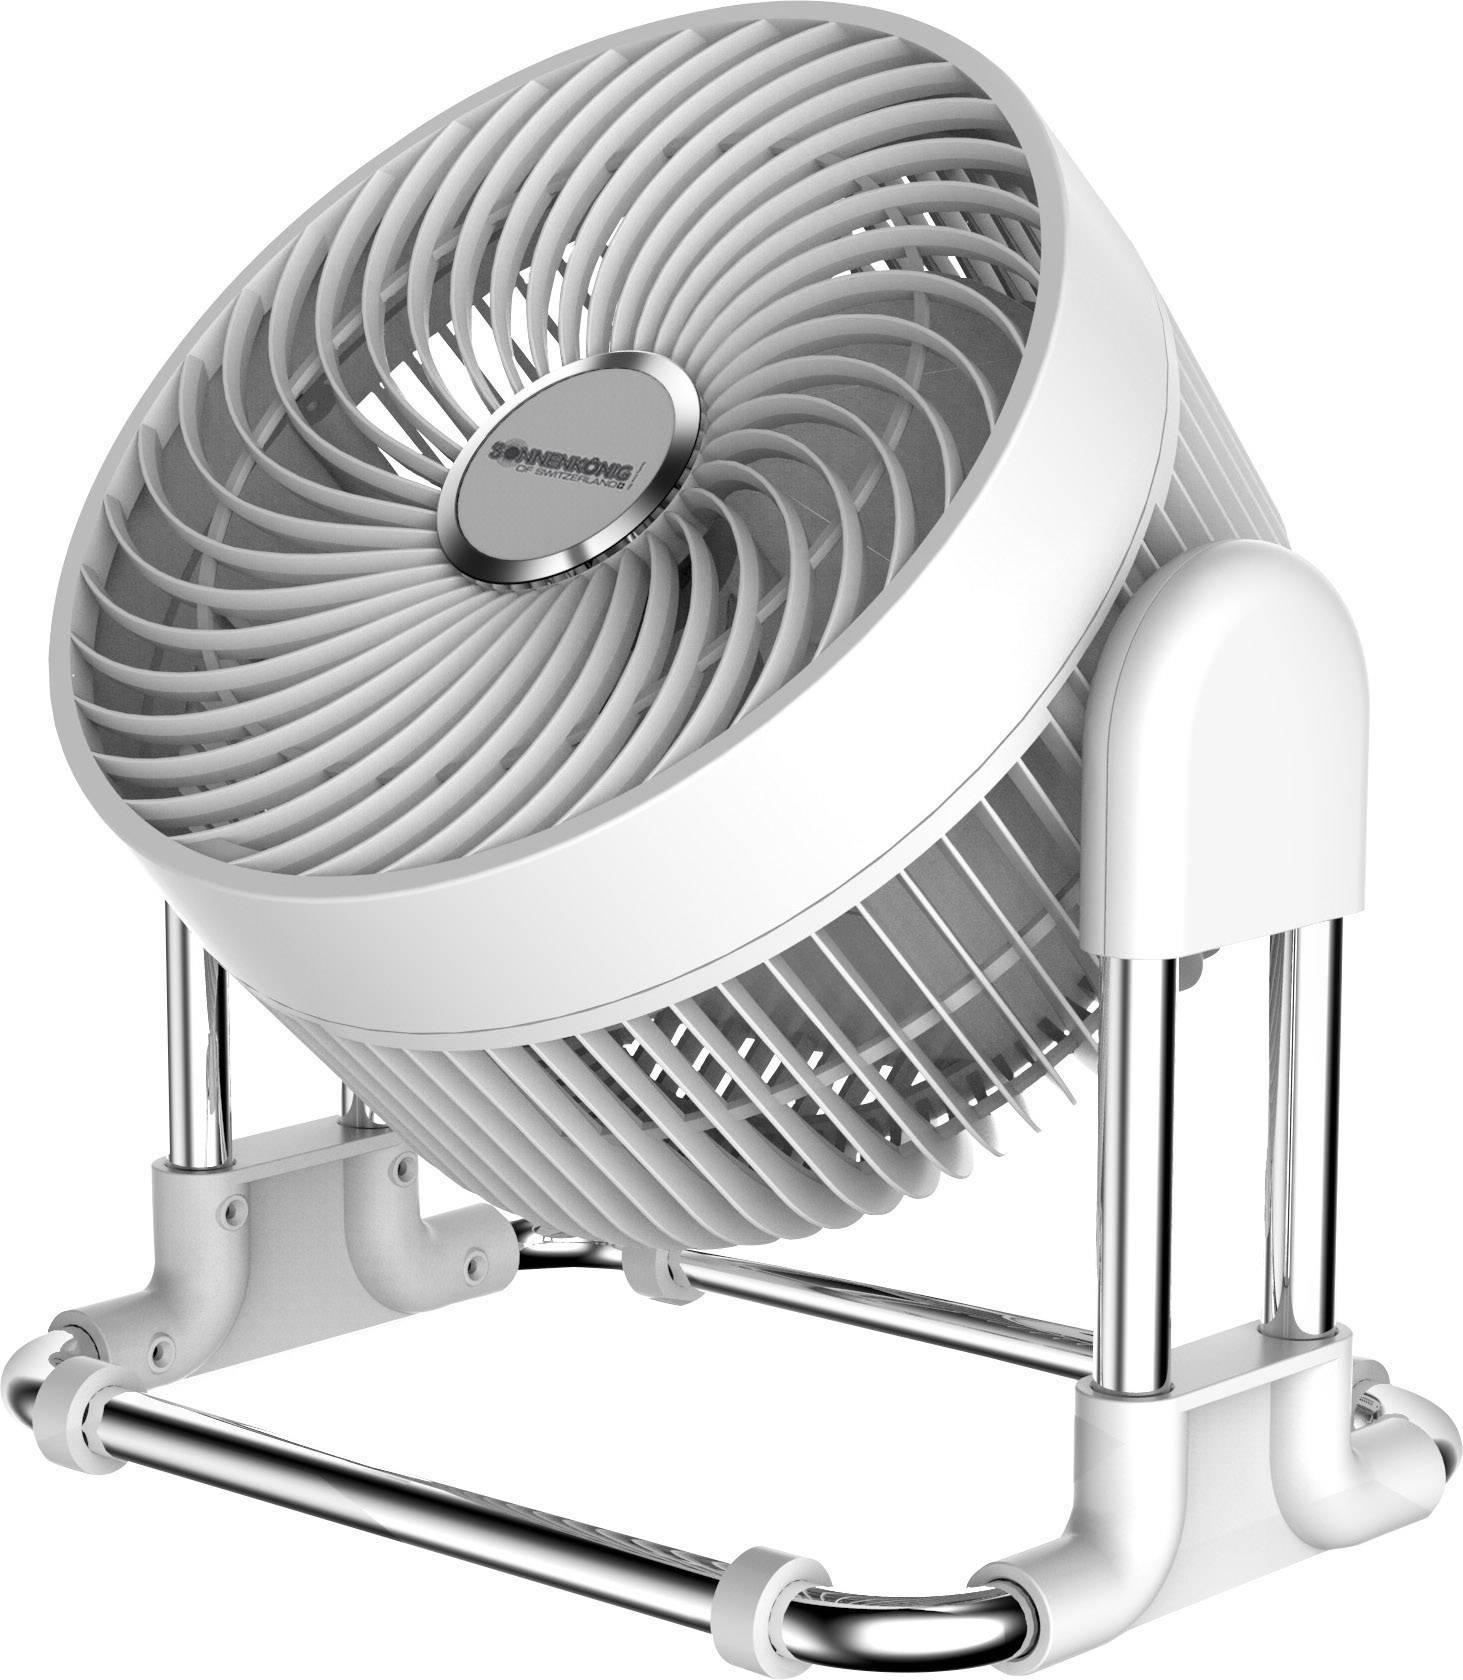 Sonnenkönig Vind Ventilatore da tavolo 45 W Bianco